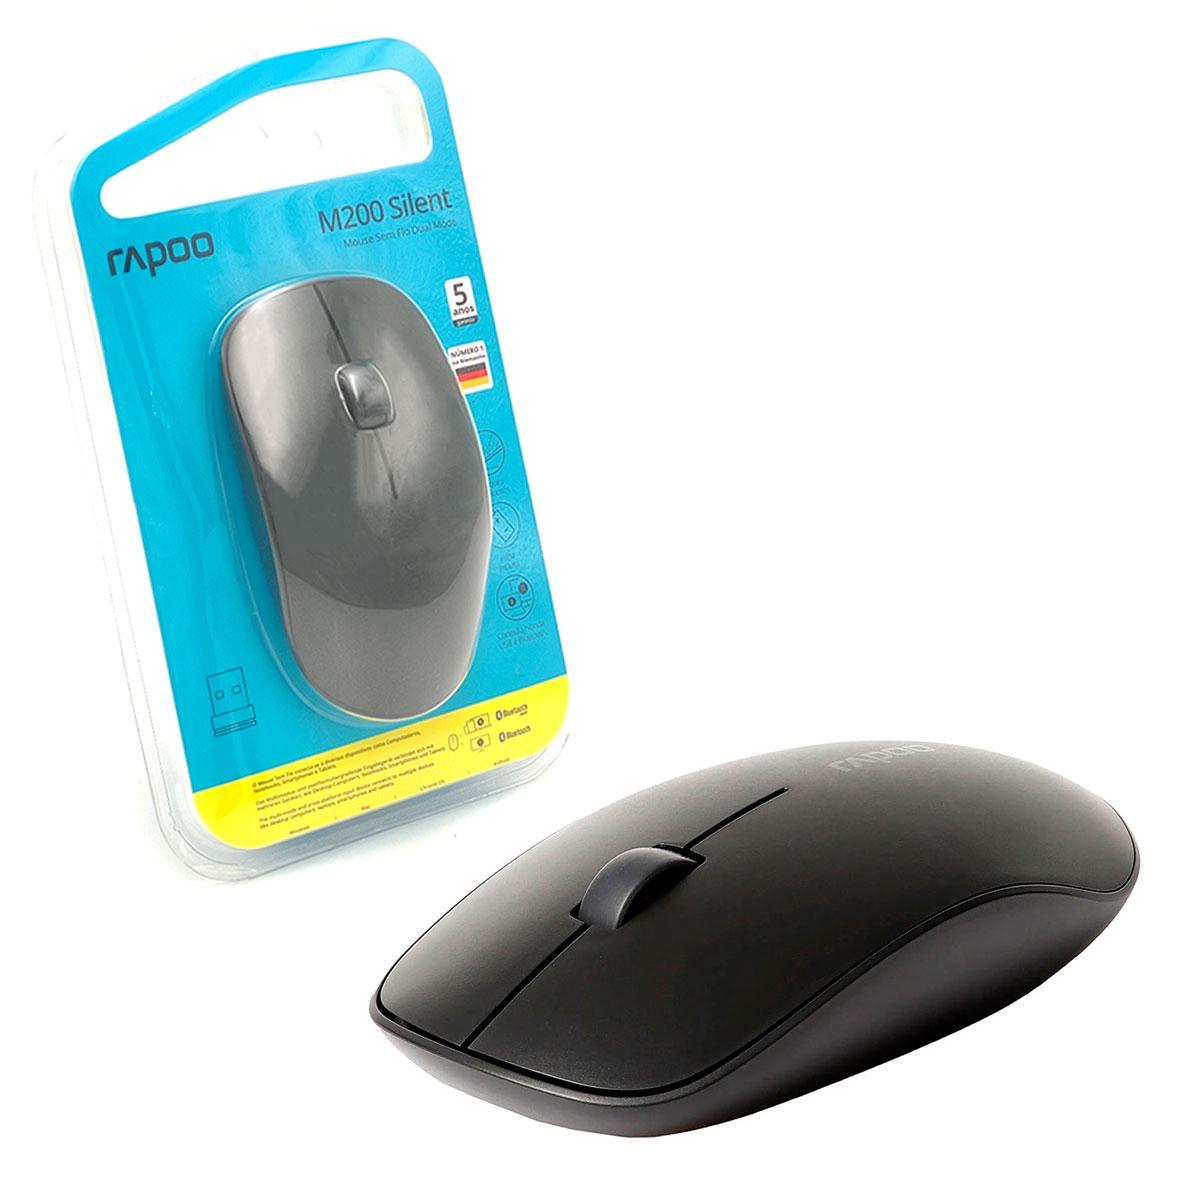 Mouse Rapoo M200 Silent, Wireless 2.4 GHz, Bluetooth, 1300 DPI, Clique Silencioso, Preto - RA011